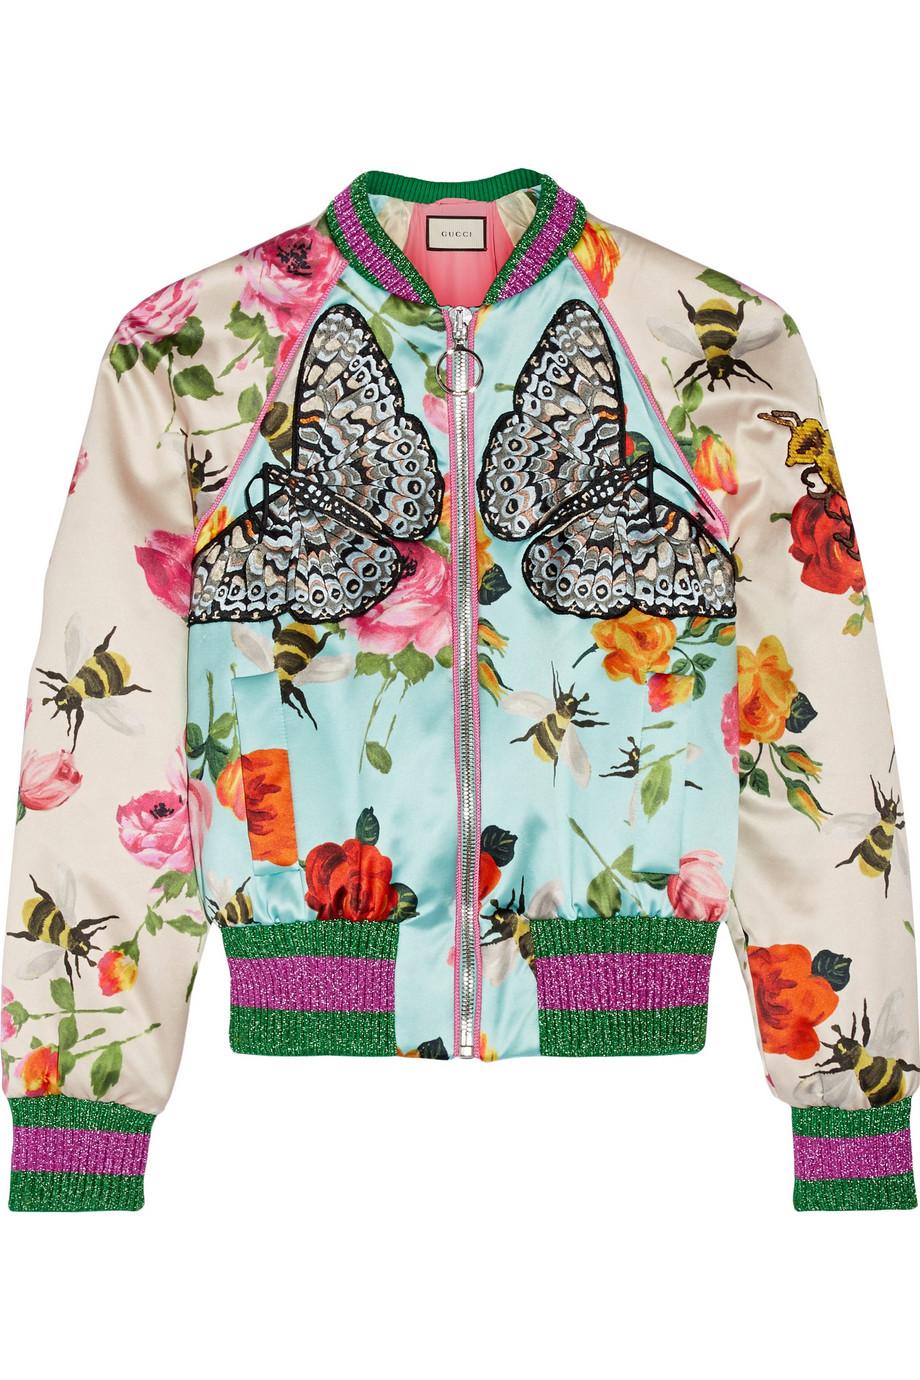 9. Gucci $3,990.jpg